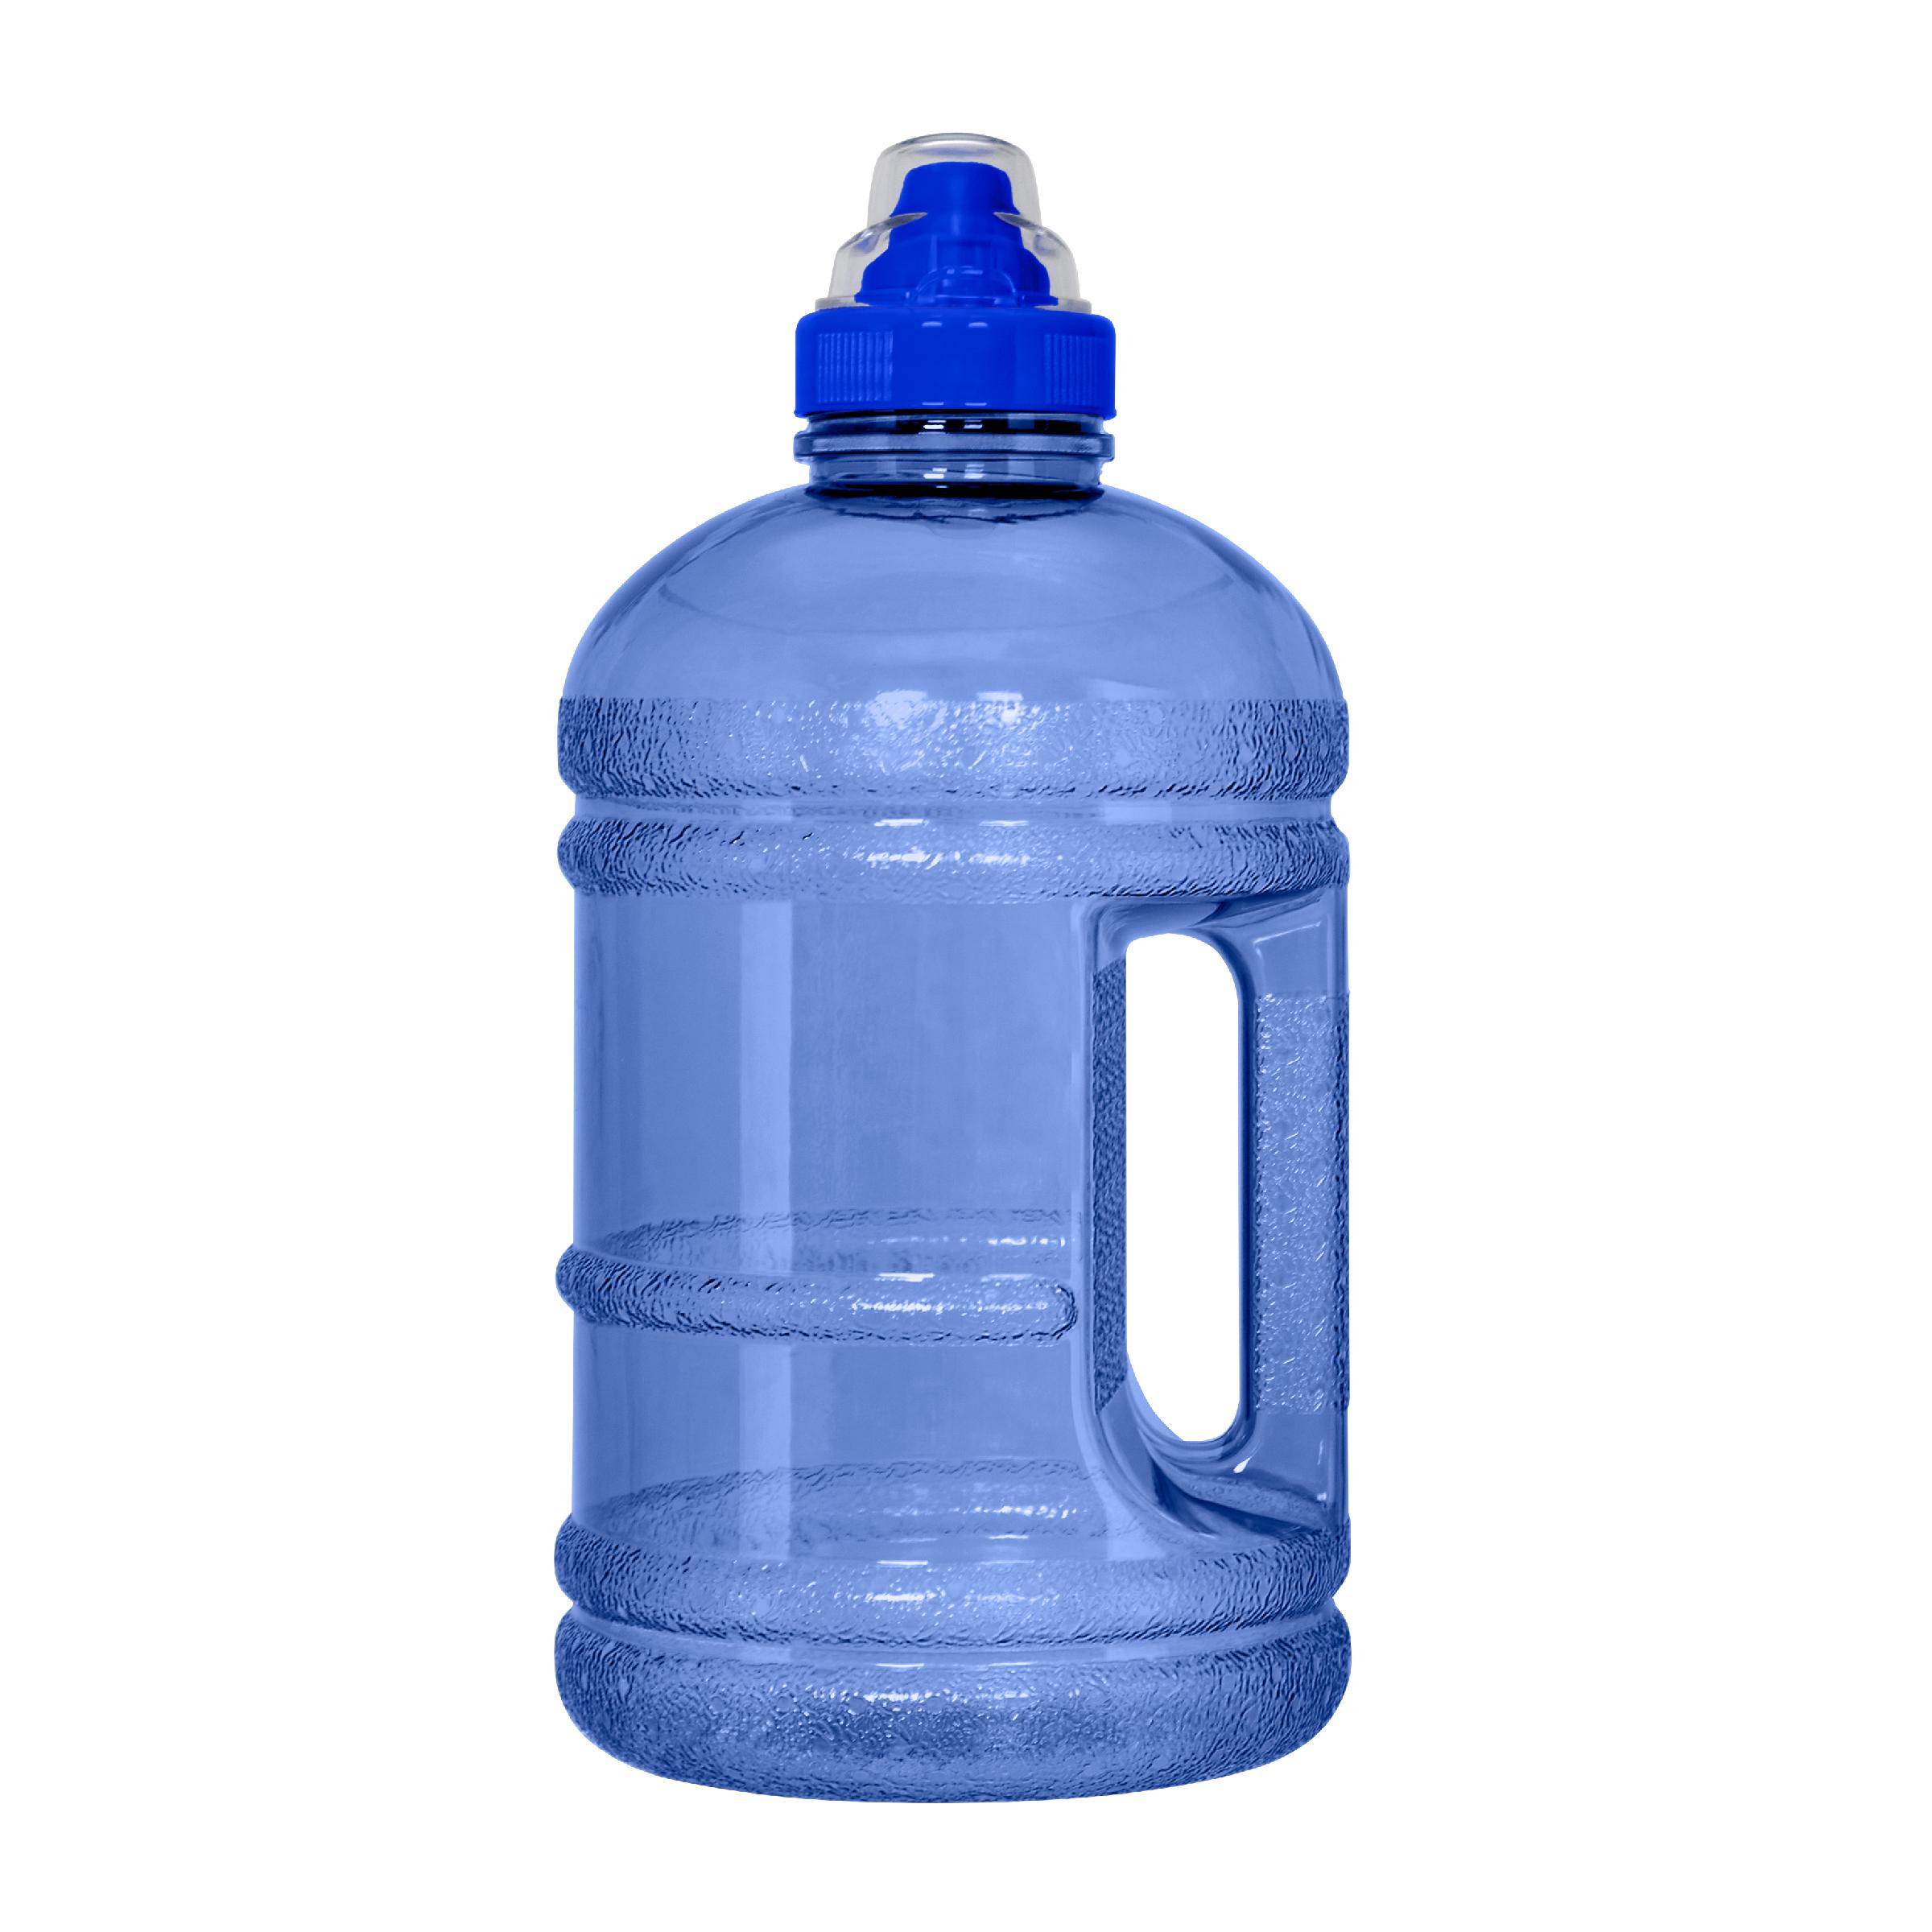 973b5f2d1e 1/2 Gallon (64 oz.) BPA FREE Plastic Water Bottle w/48mm Sports Cap ...